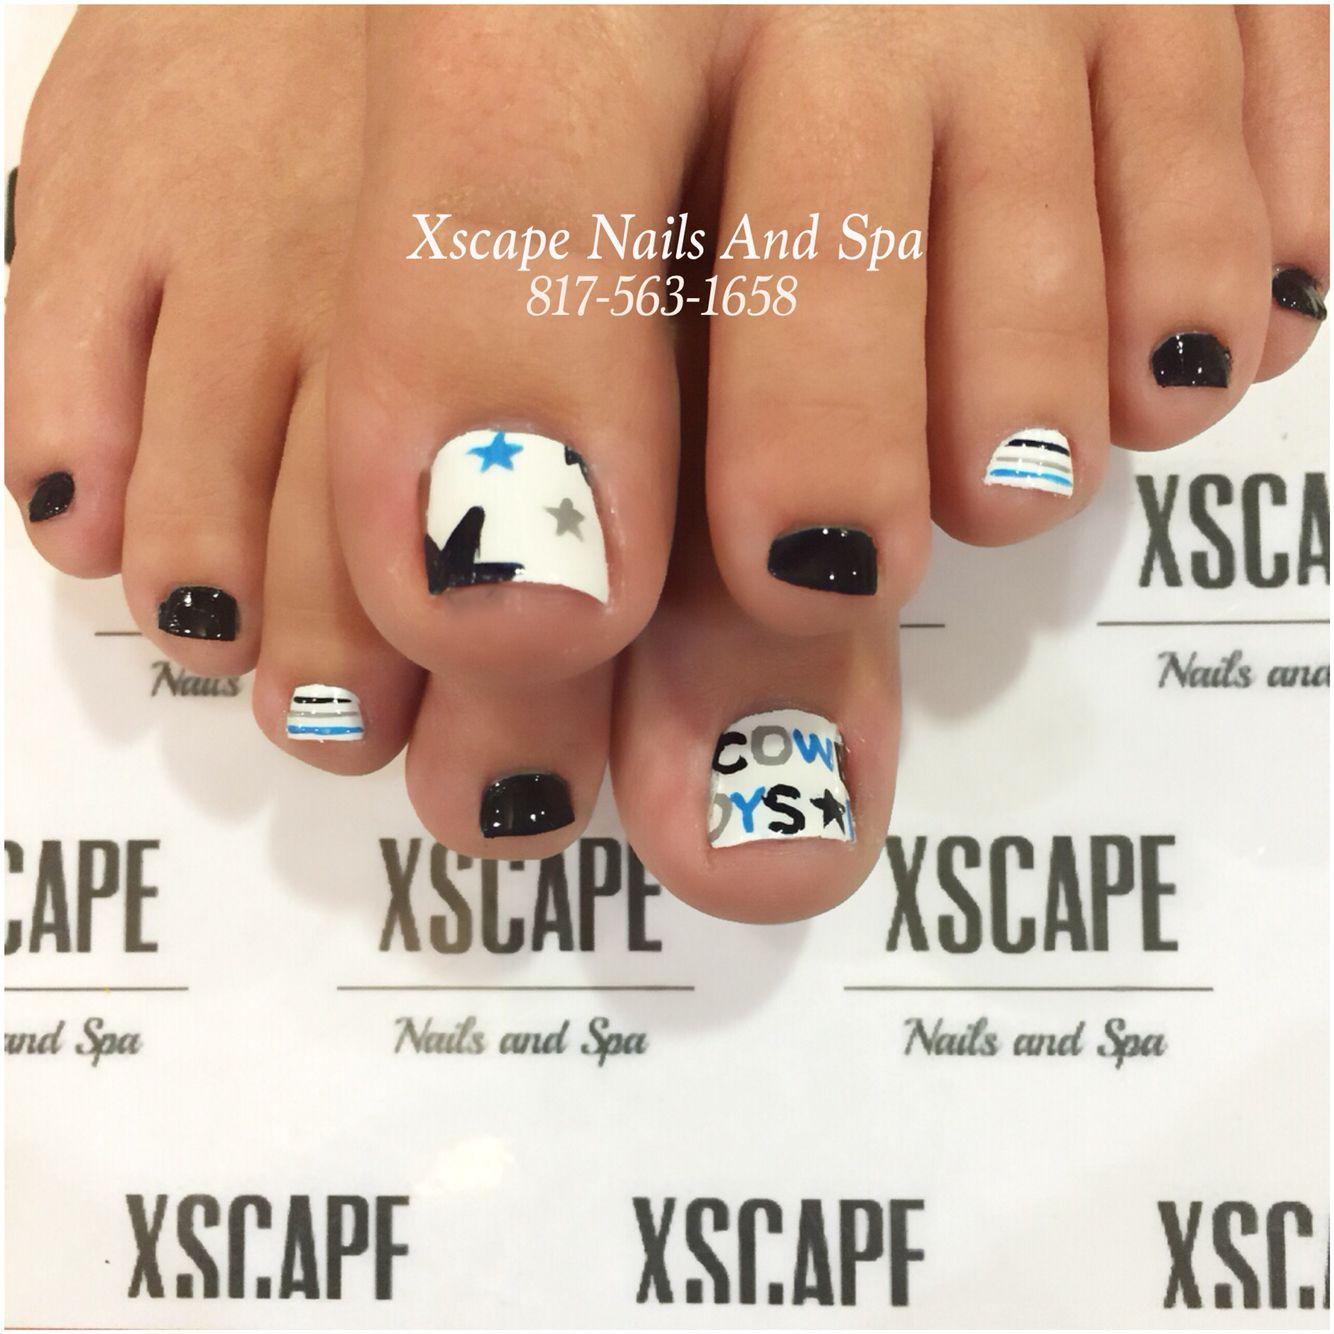 Dallas cowboys nail designs | Cute Nails Designs | Pinterest ...